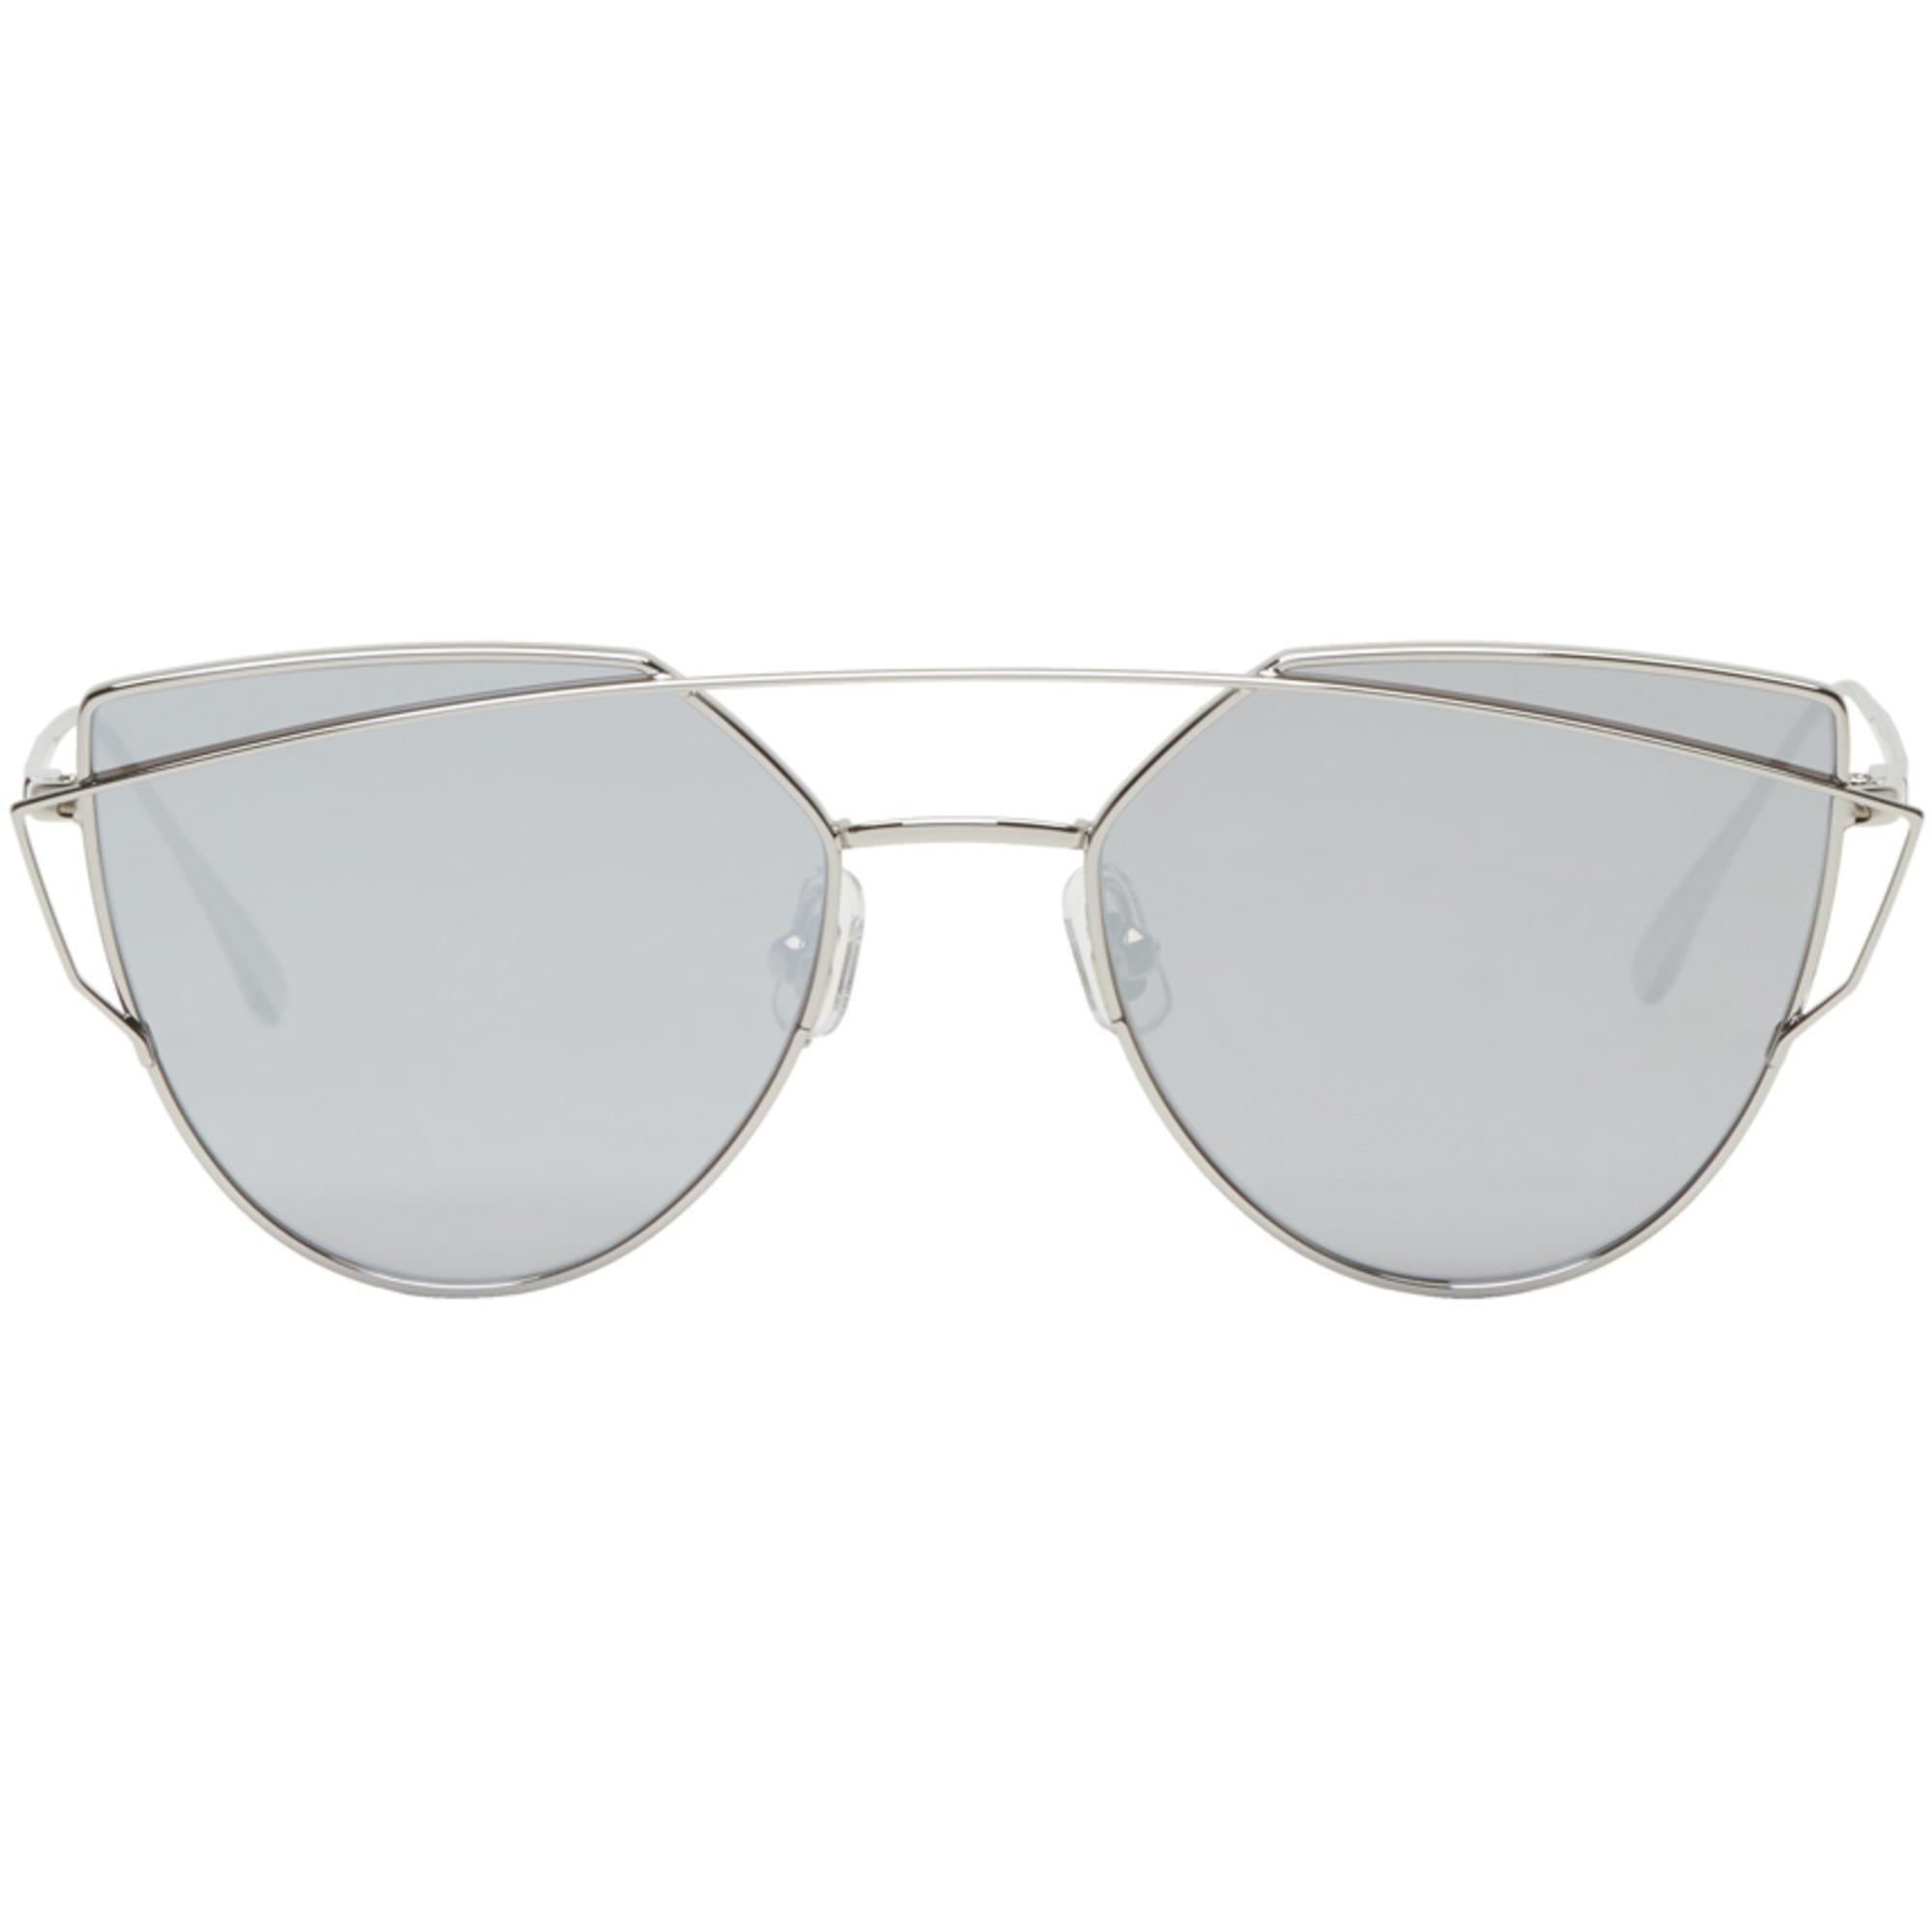 f57e949468c6 Lyst - Gentle Monster Silver Love Punch Sunglasses in Metallic